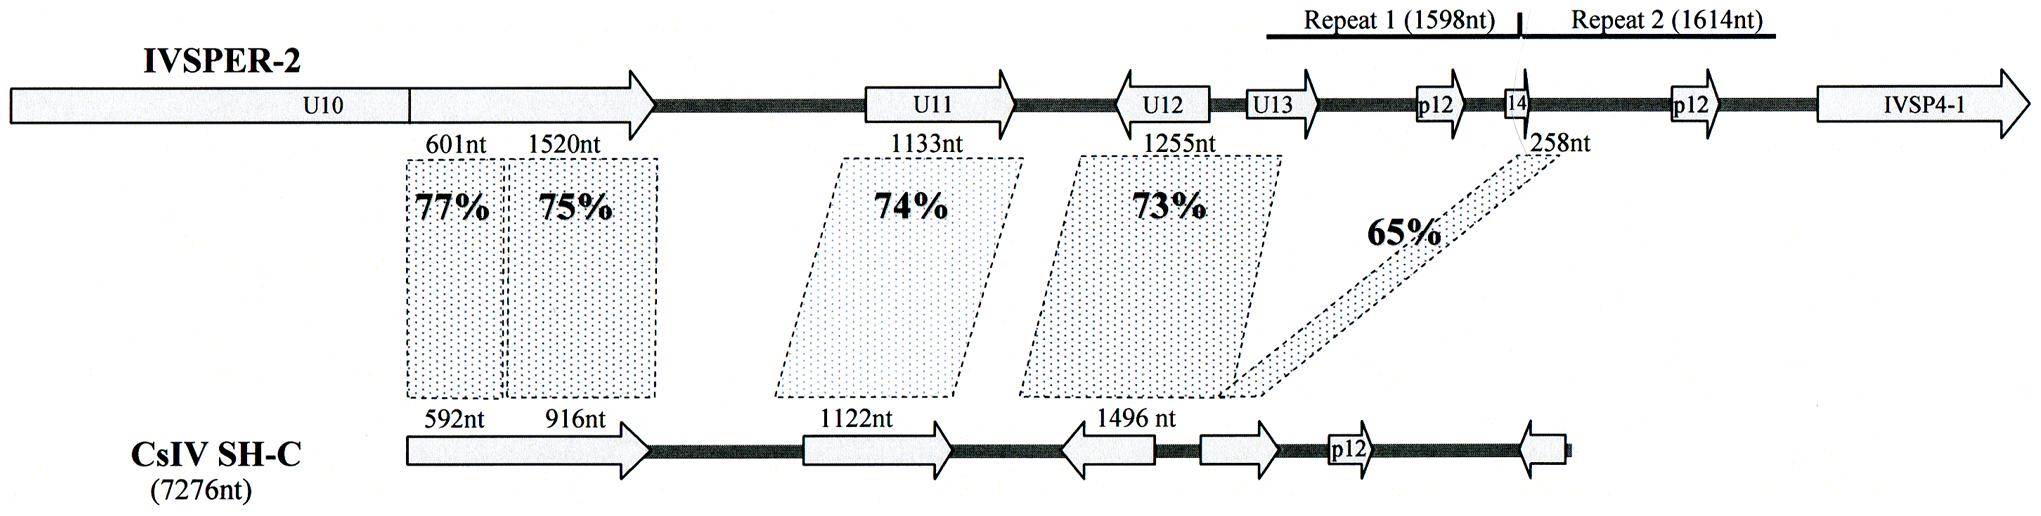 Schematic representation of the region in <i>H. didymator</i> IVSPER-2 displaying similarity to <i>Campoletis sonorensis</i> IV segment SH-C (NCBI Reference: NC_007986.1).